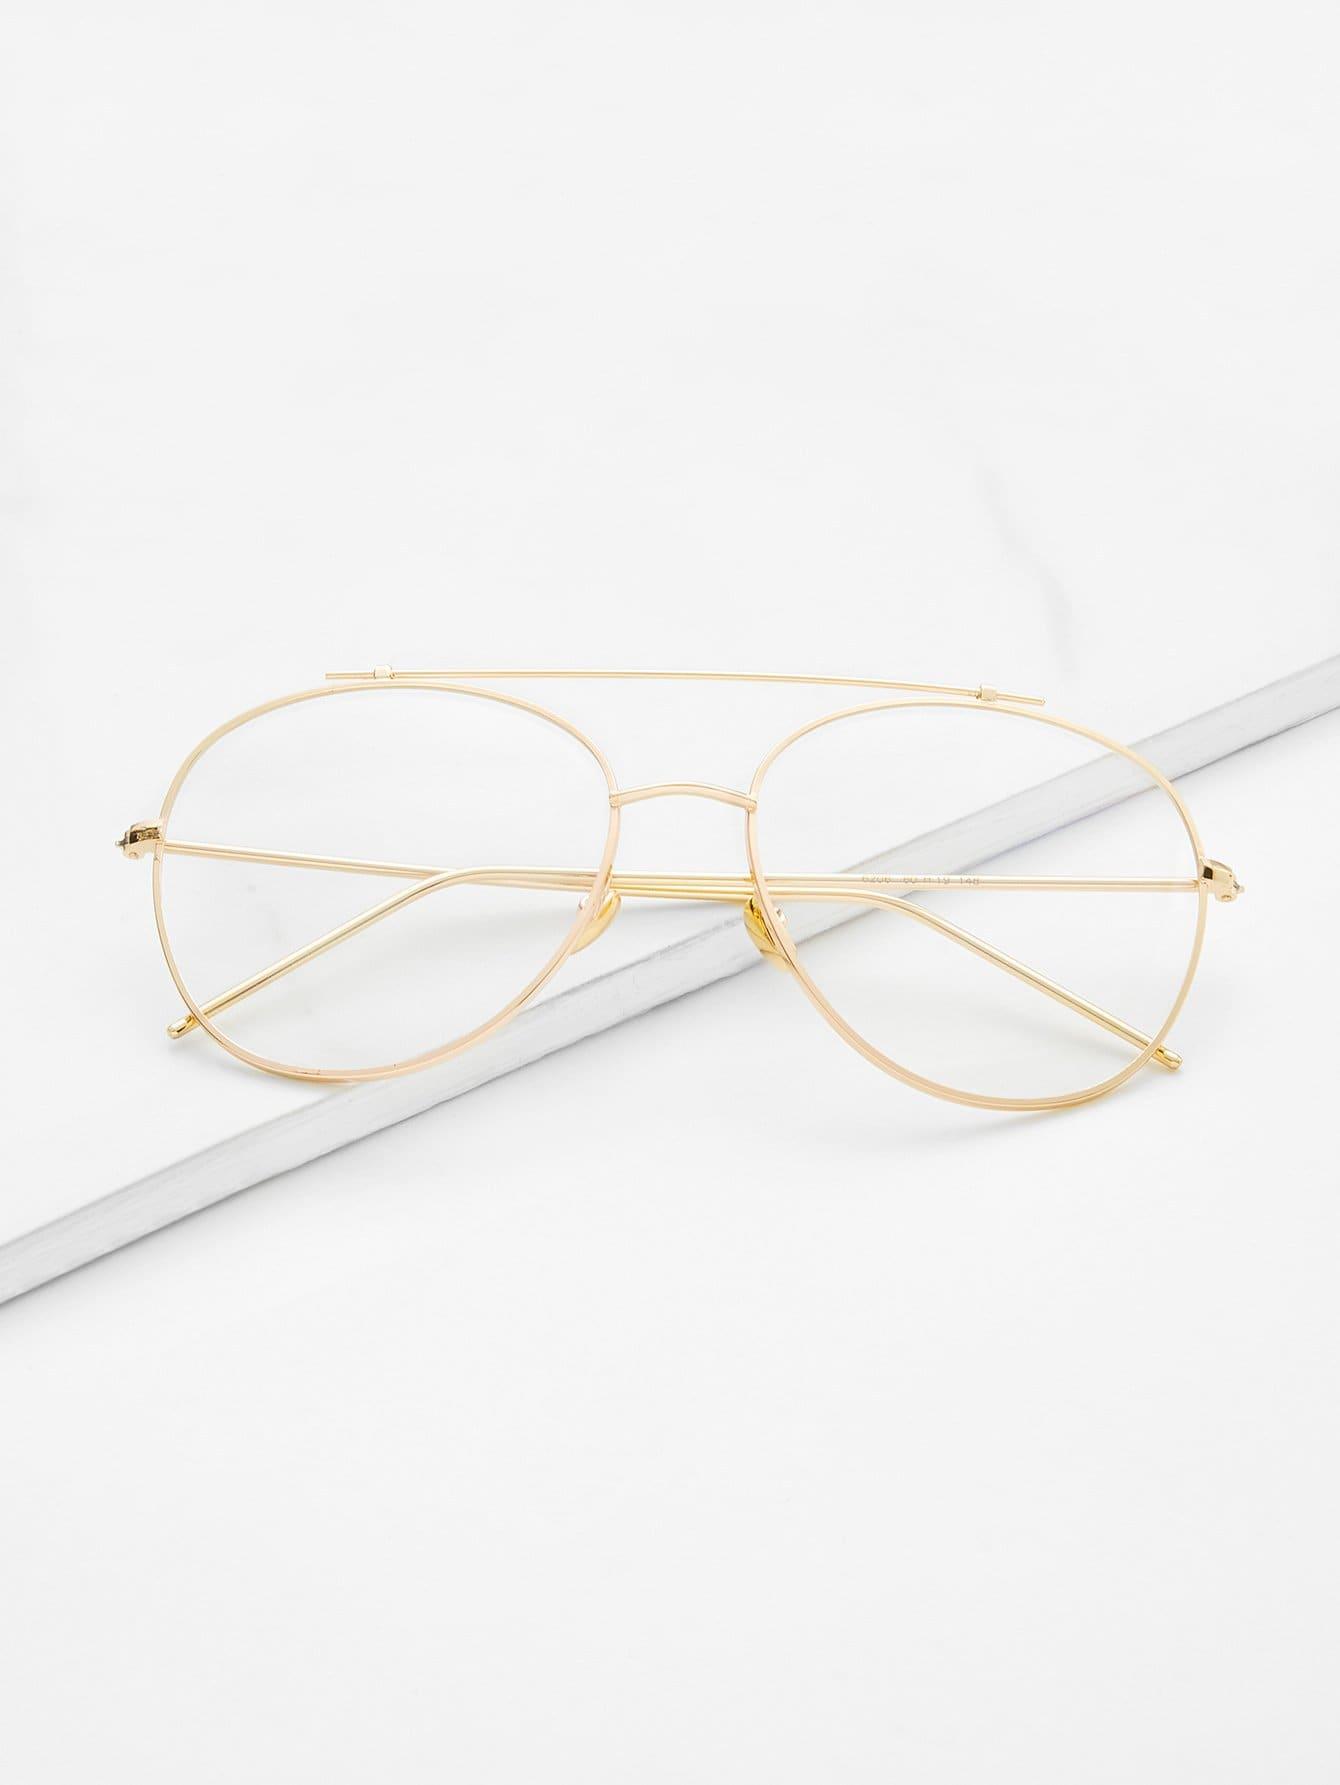 Gold Frame Clear Lens Double Bridge Glasses dark grey frame clear lens glasses